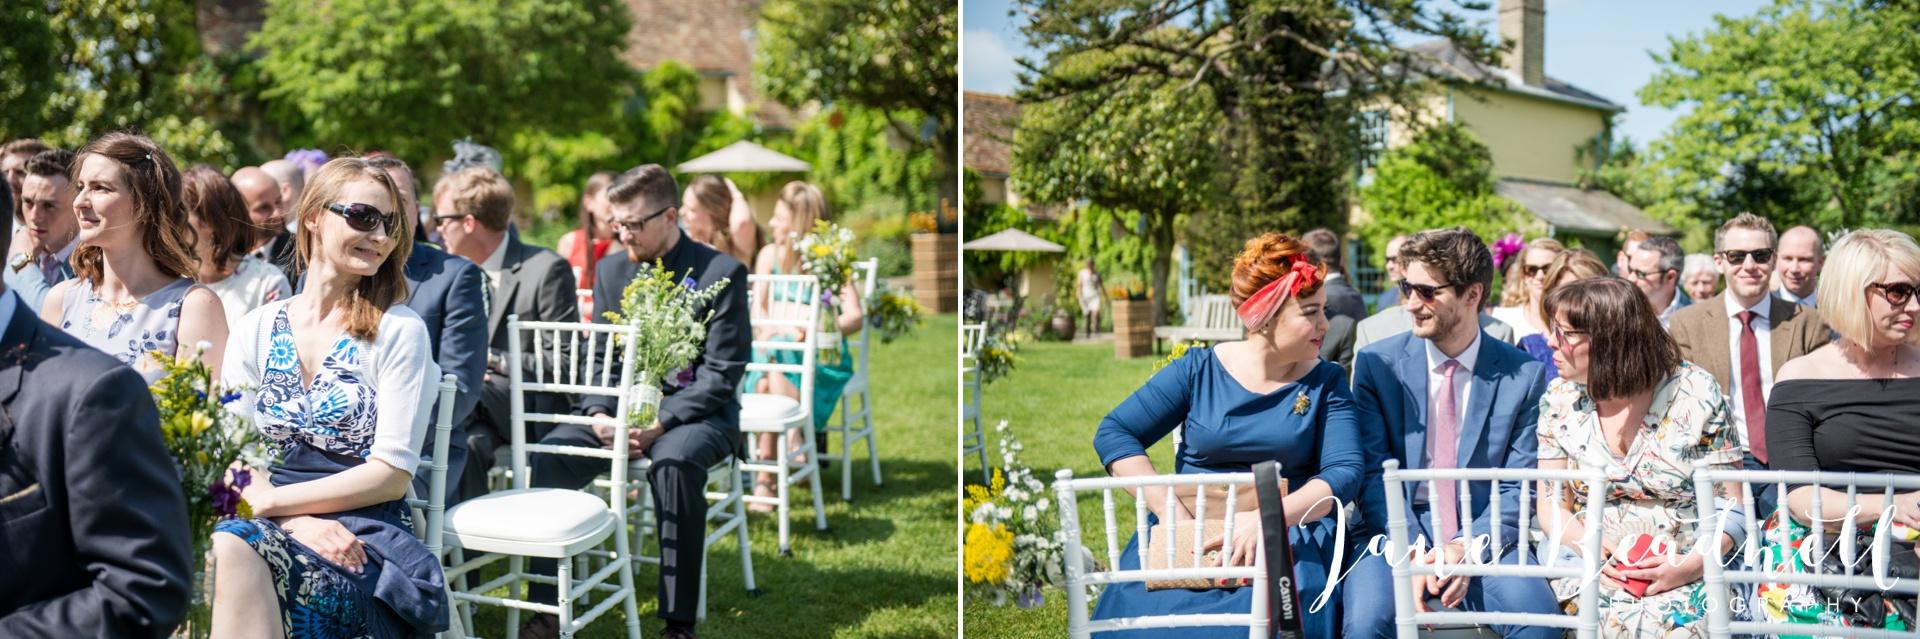 South Farm Wedding photography Hertfordshire by Jane Beadnell Photography fine art wedding photographer_0058